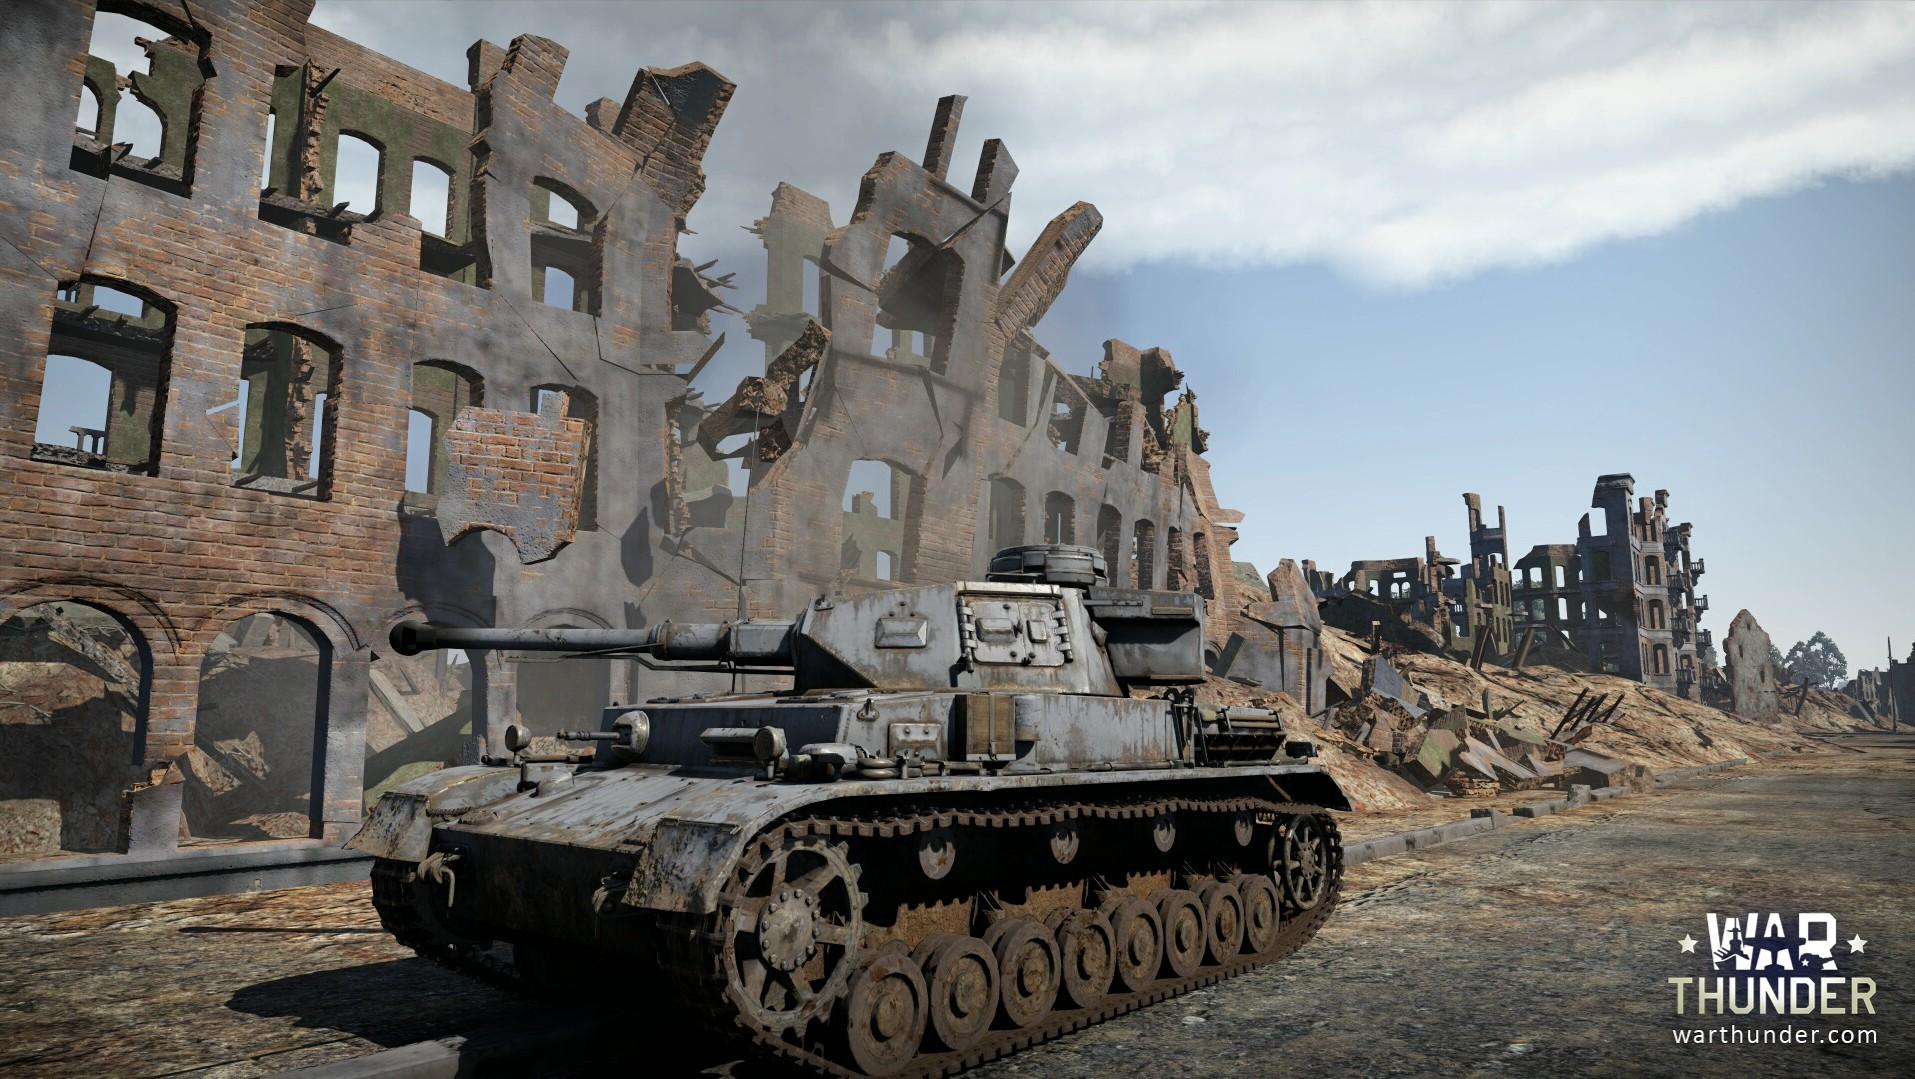 Water Tank Destruction : War thunder firestorm update adds game changing nvidia